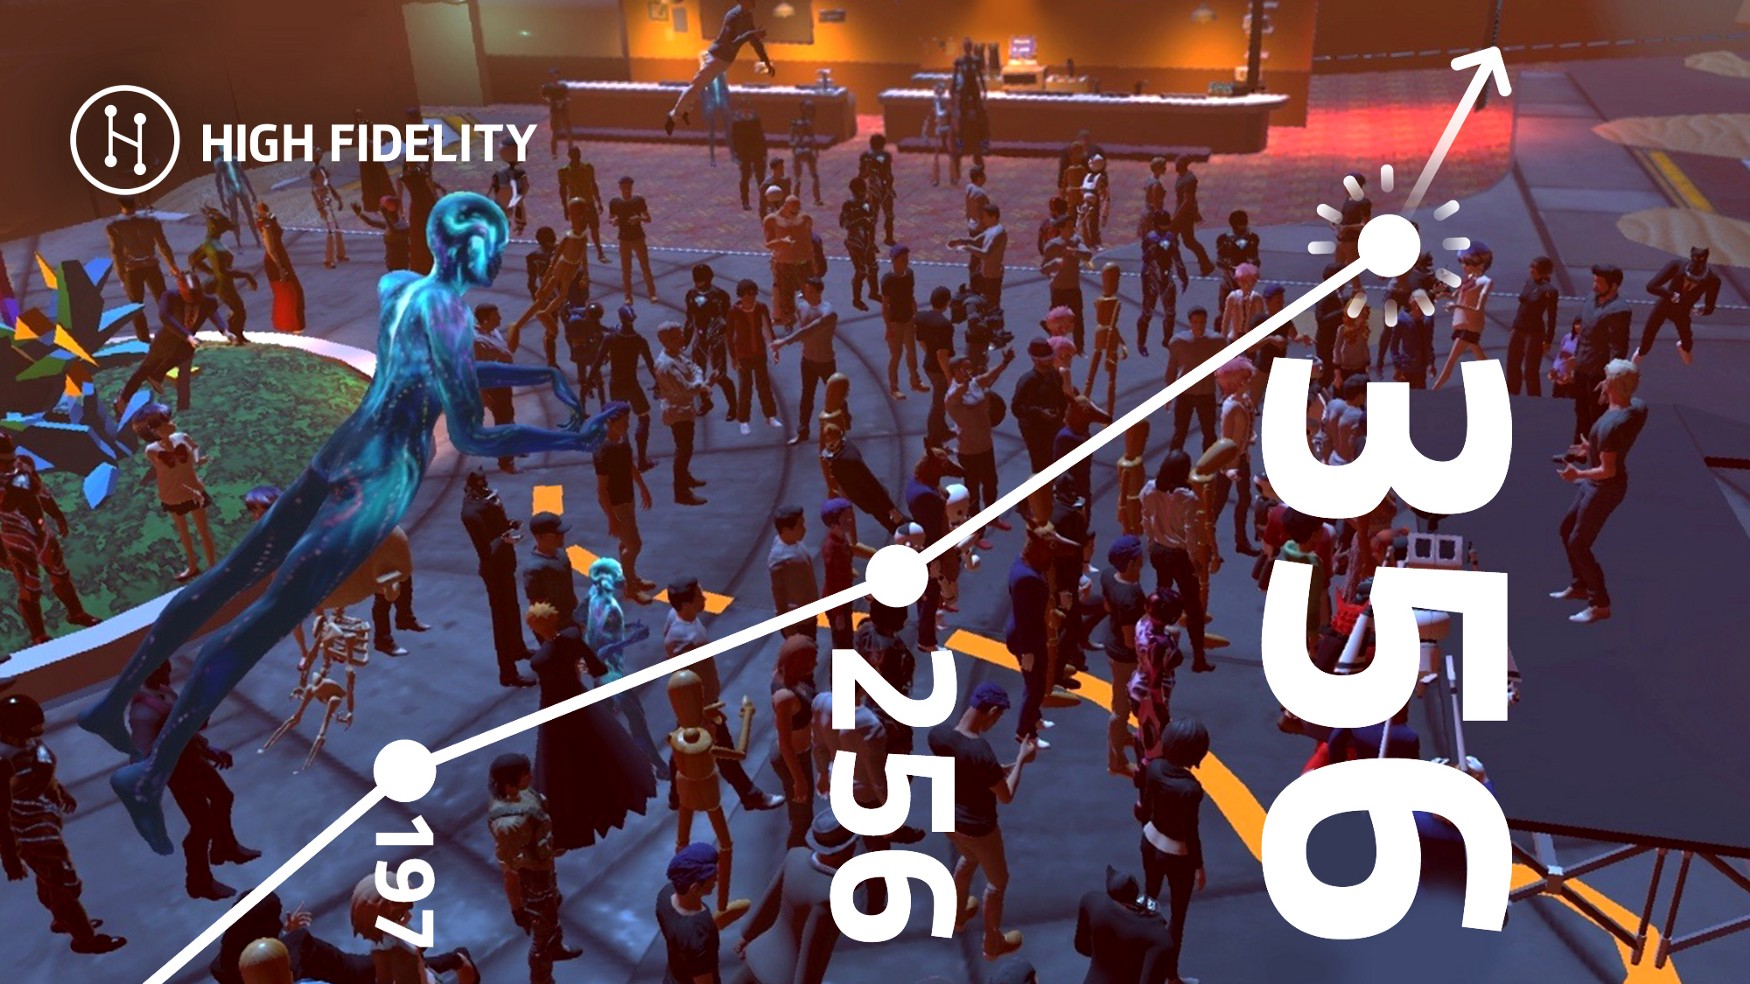 356 Avatars, Together!